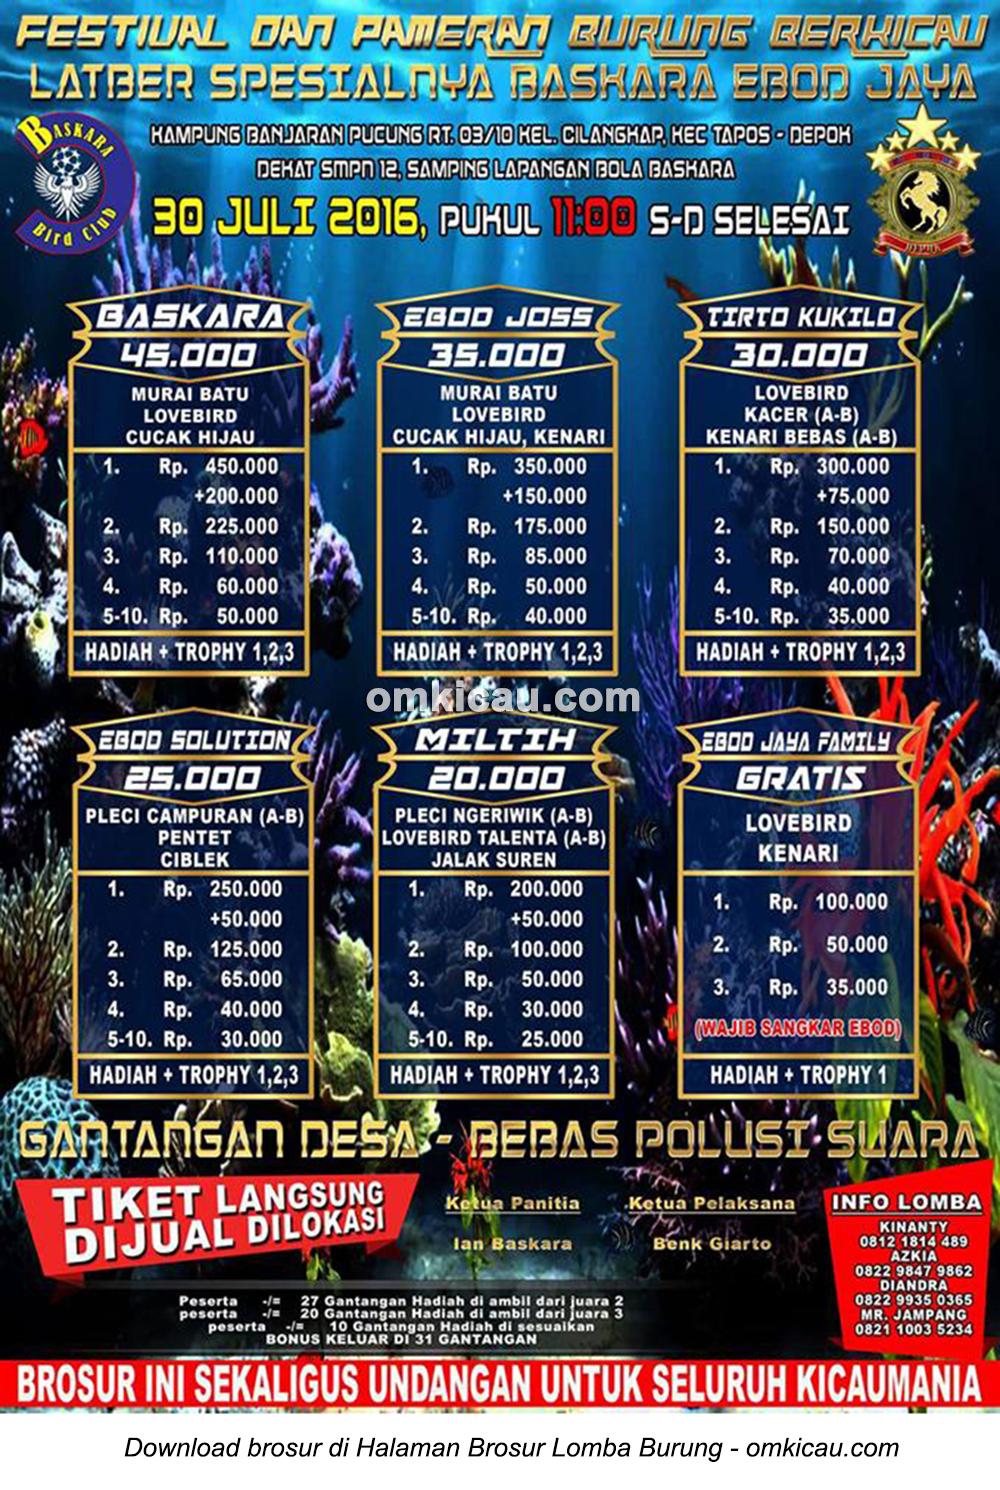 Brosur Latber Sesial Baskara Ebod Jaya, Depok, 30 Juli 2016